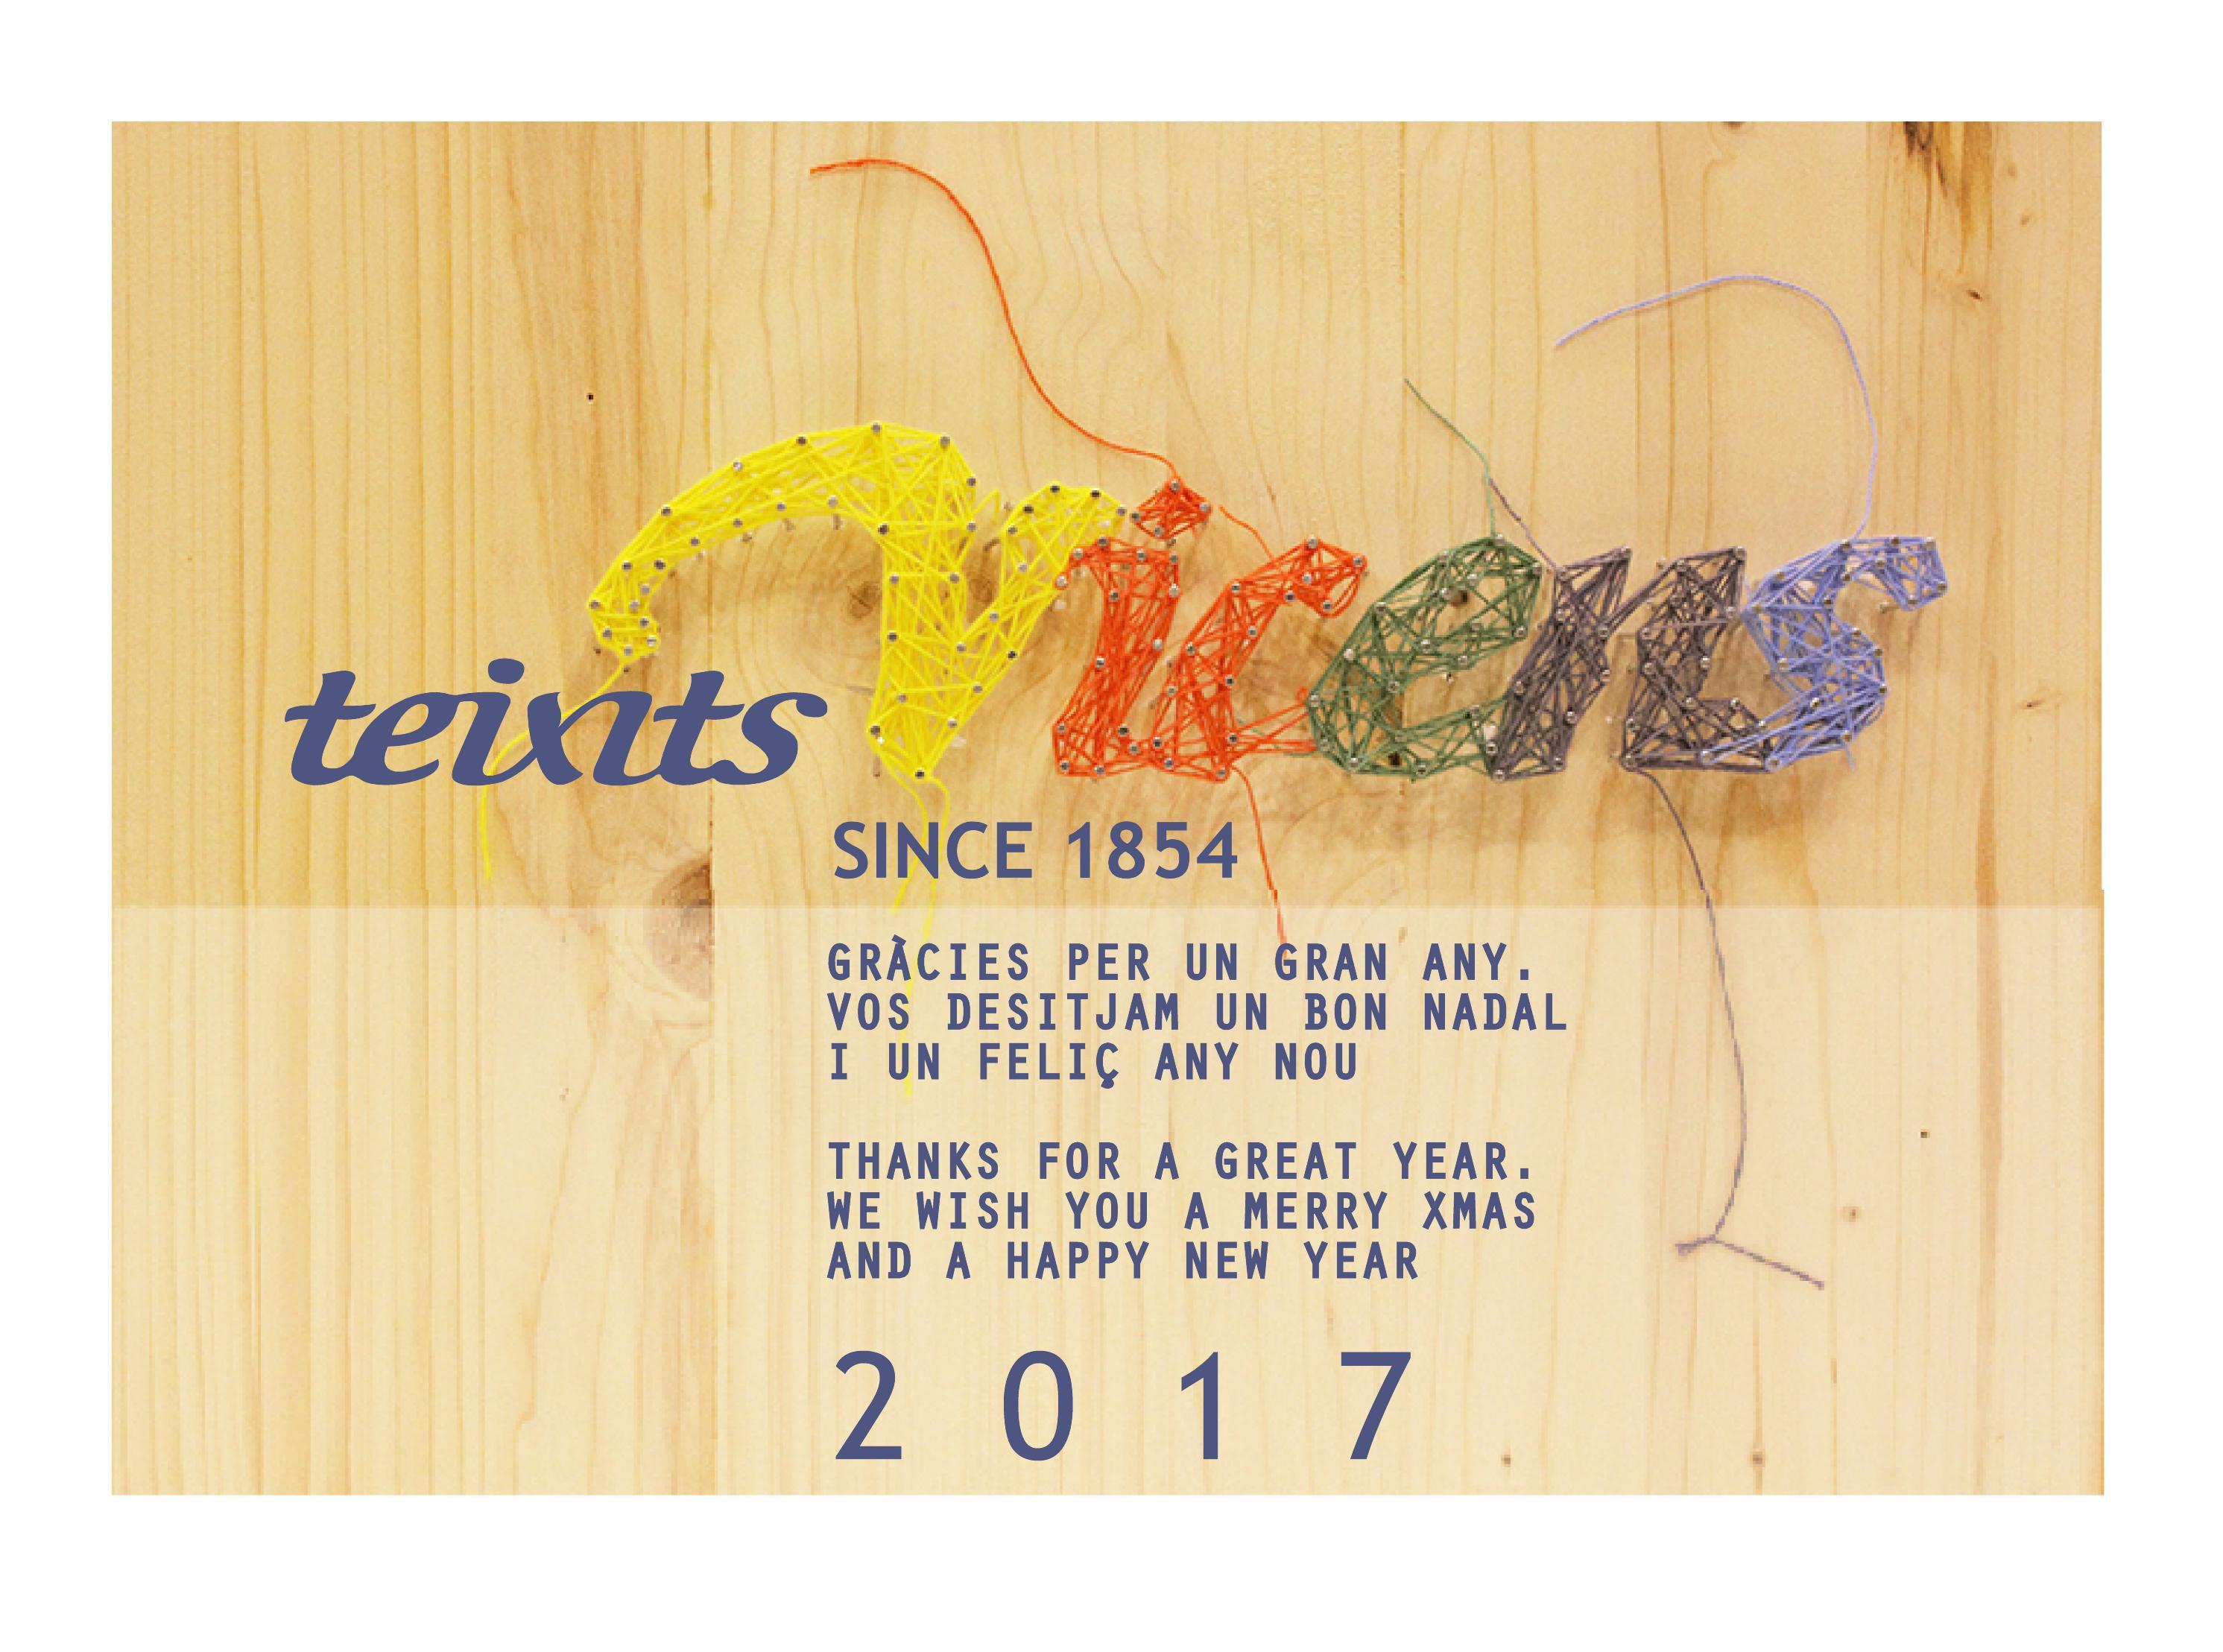 felicitacio-nadal-teixitsvicens-1